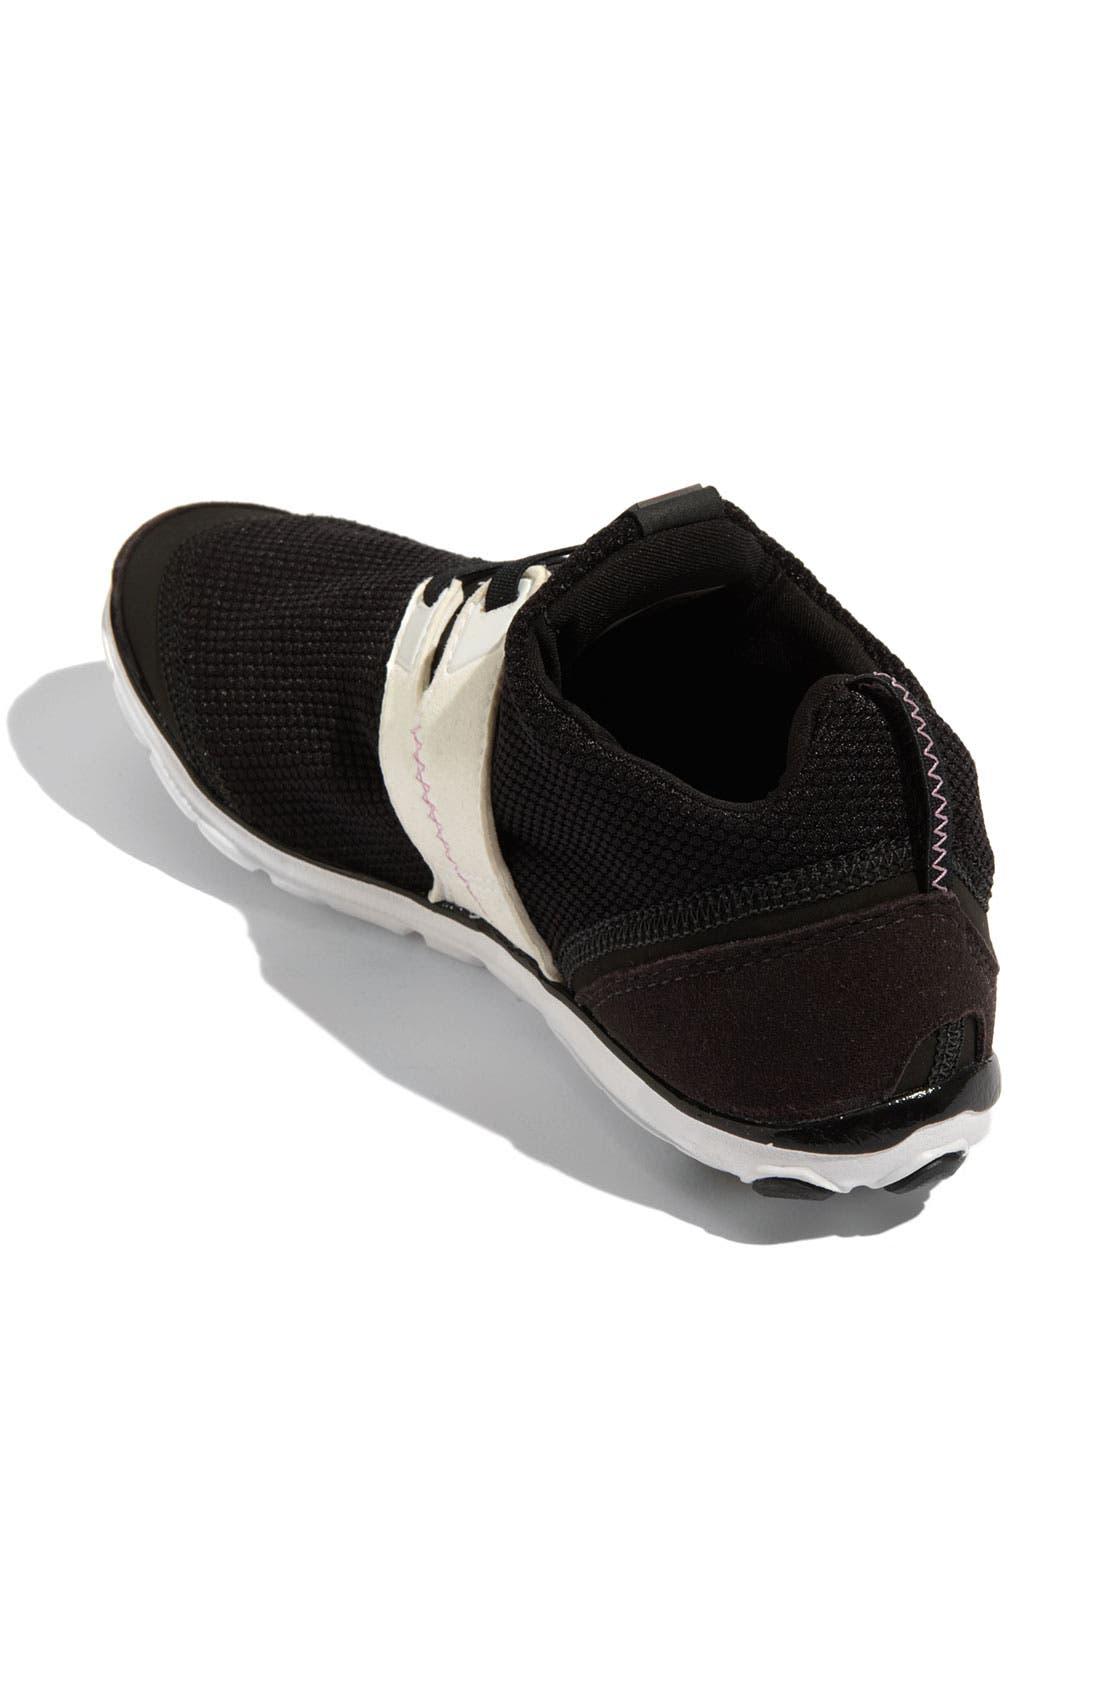 Alternate Image 2  - New Balance 'Minimus' Walking Shoe (Women)